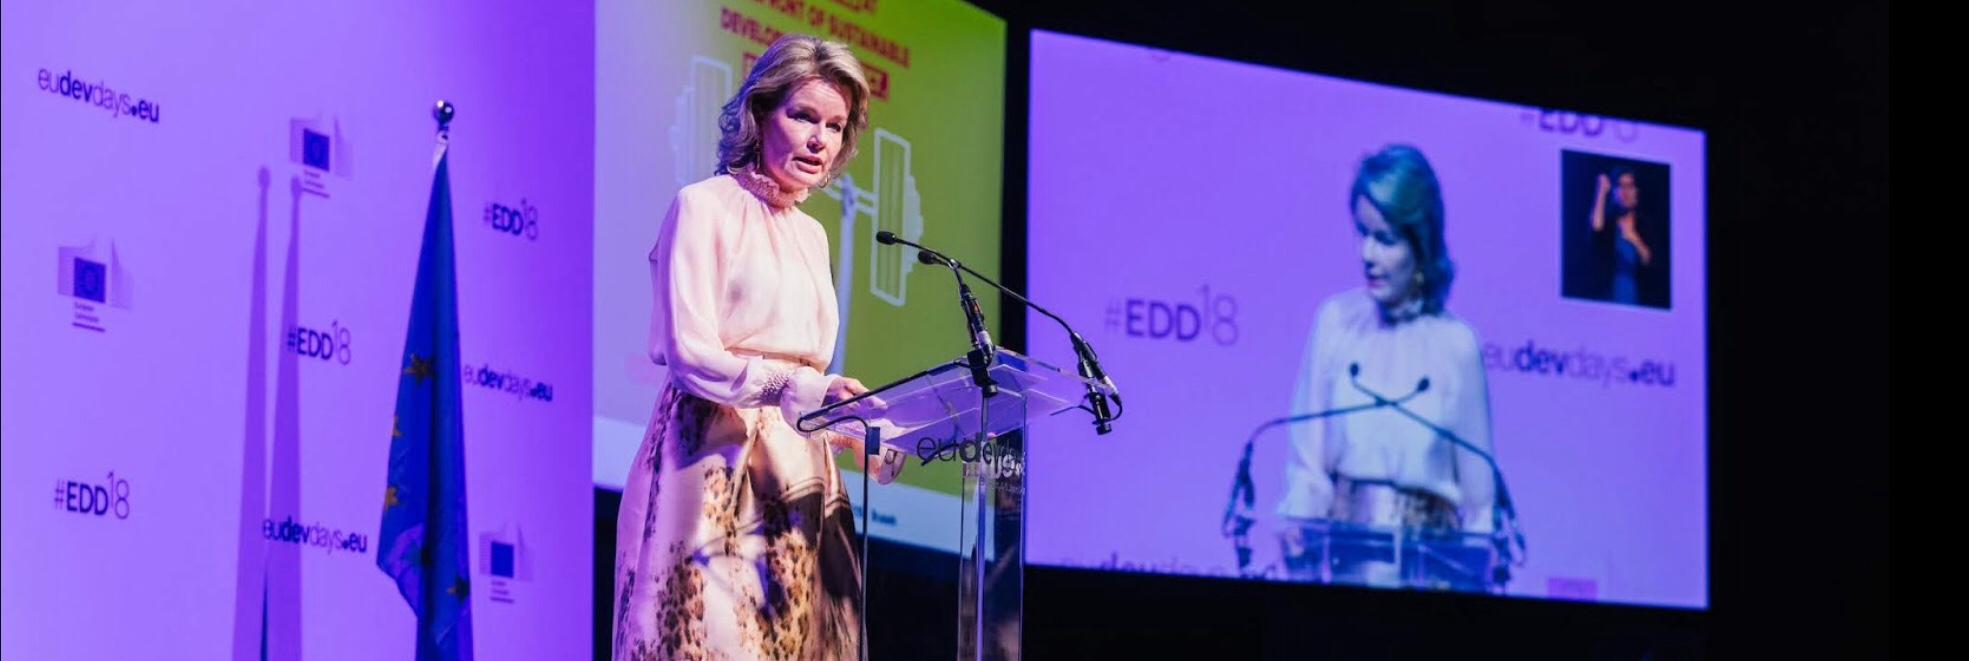 #EDD postponed to 2021